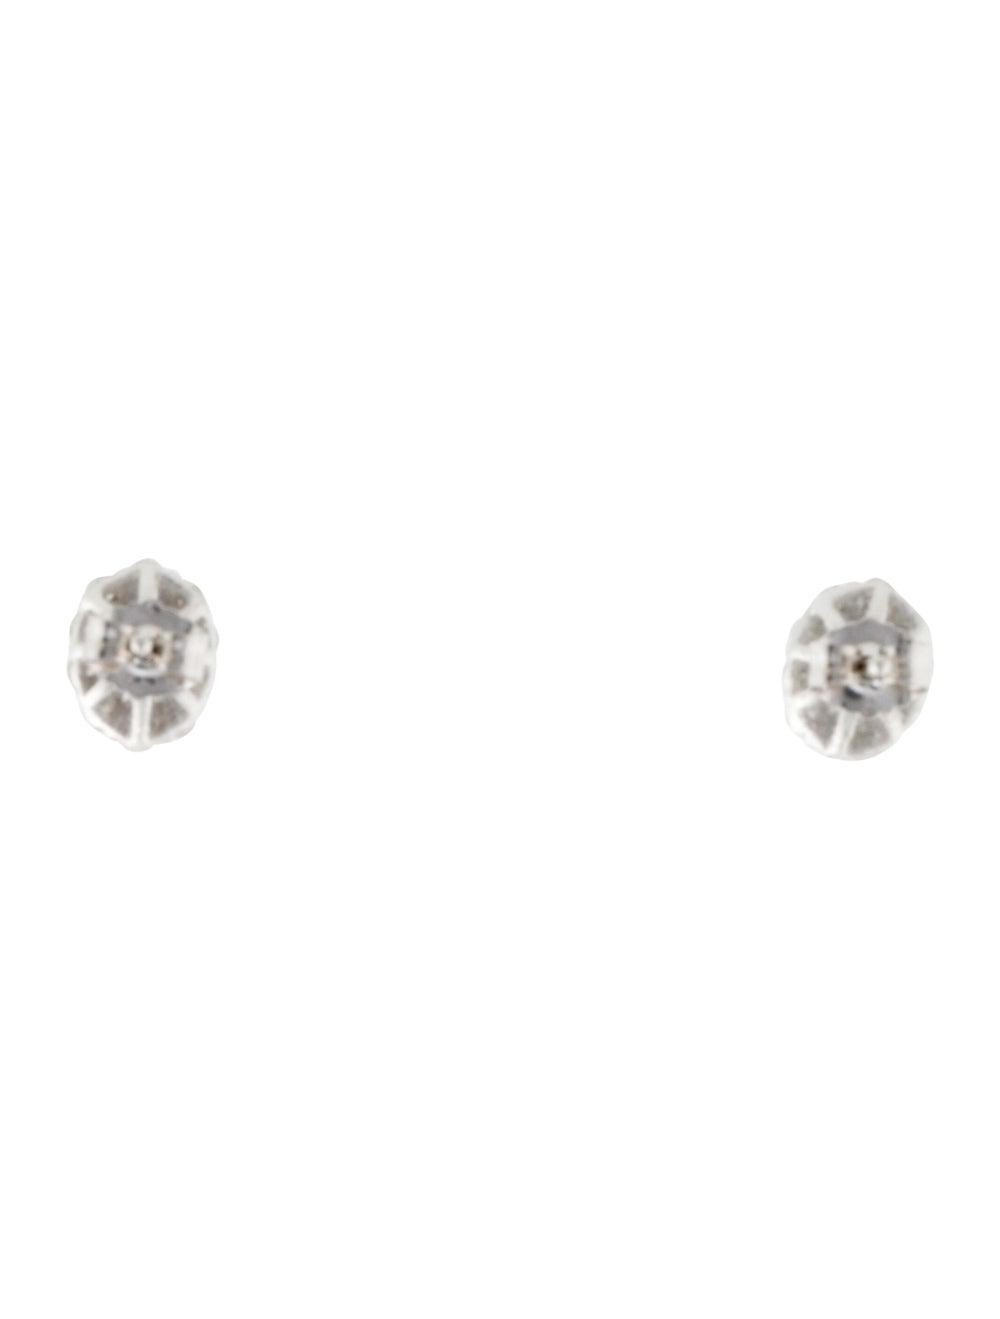 Earrings 14K Diamond Halo Stud Earrings White - image 4